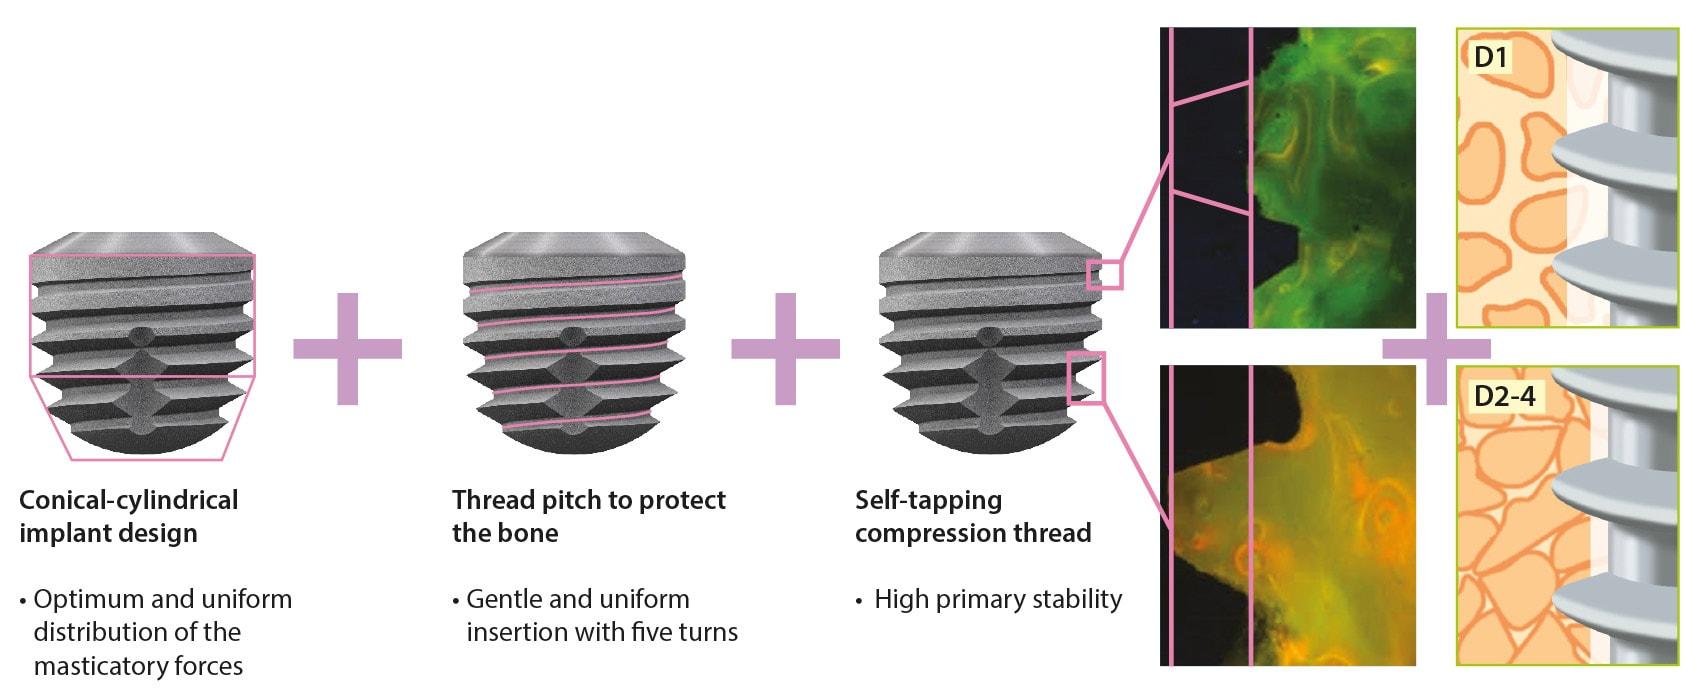 copaSKY Implant Design